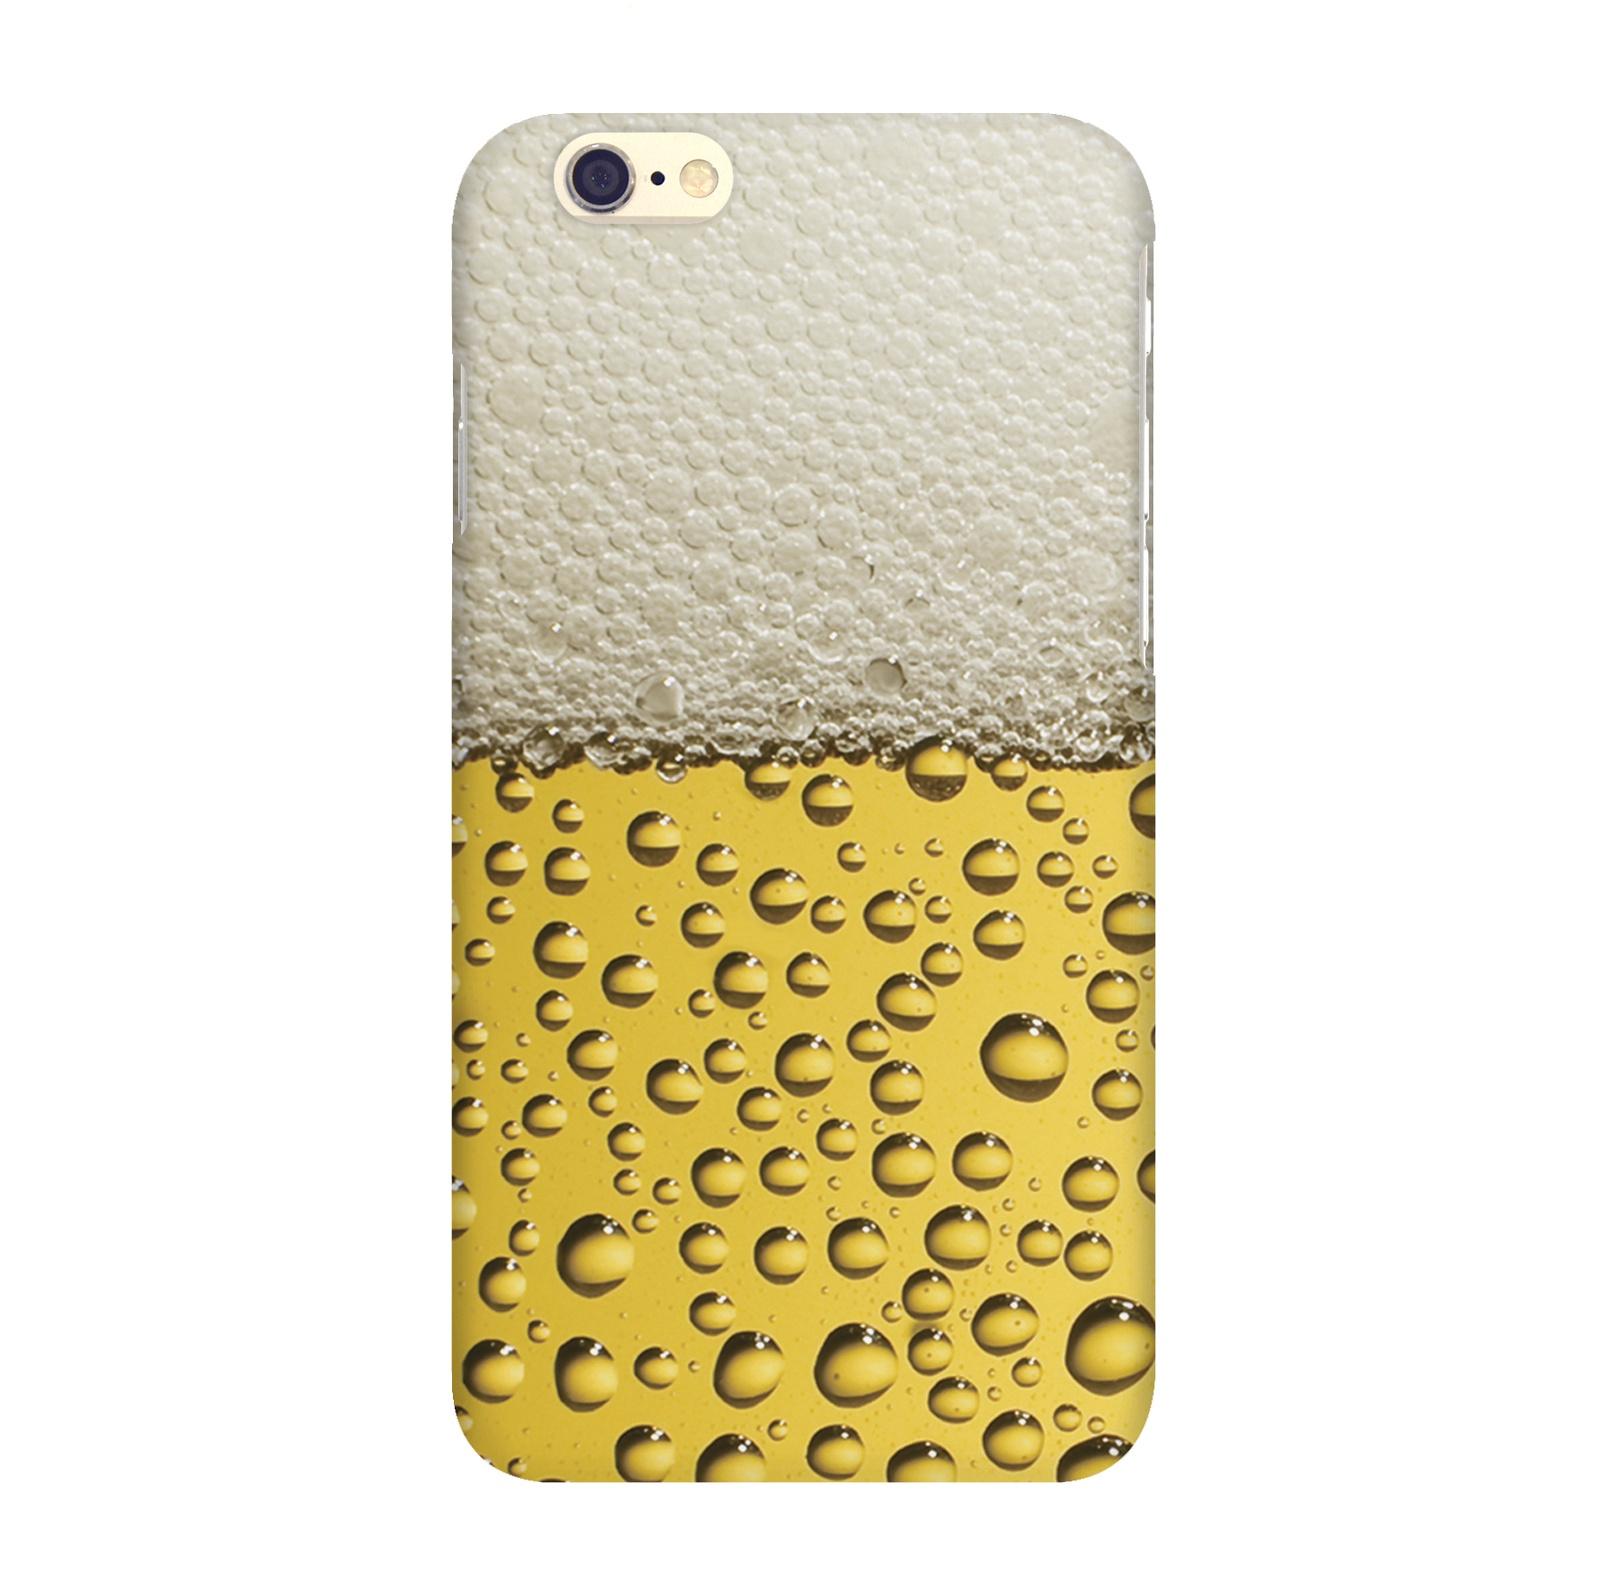 Чехол для Iphone 6 Пиво IP6.MITYA-266 цена и фото